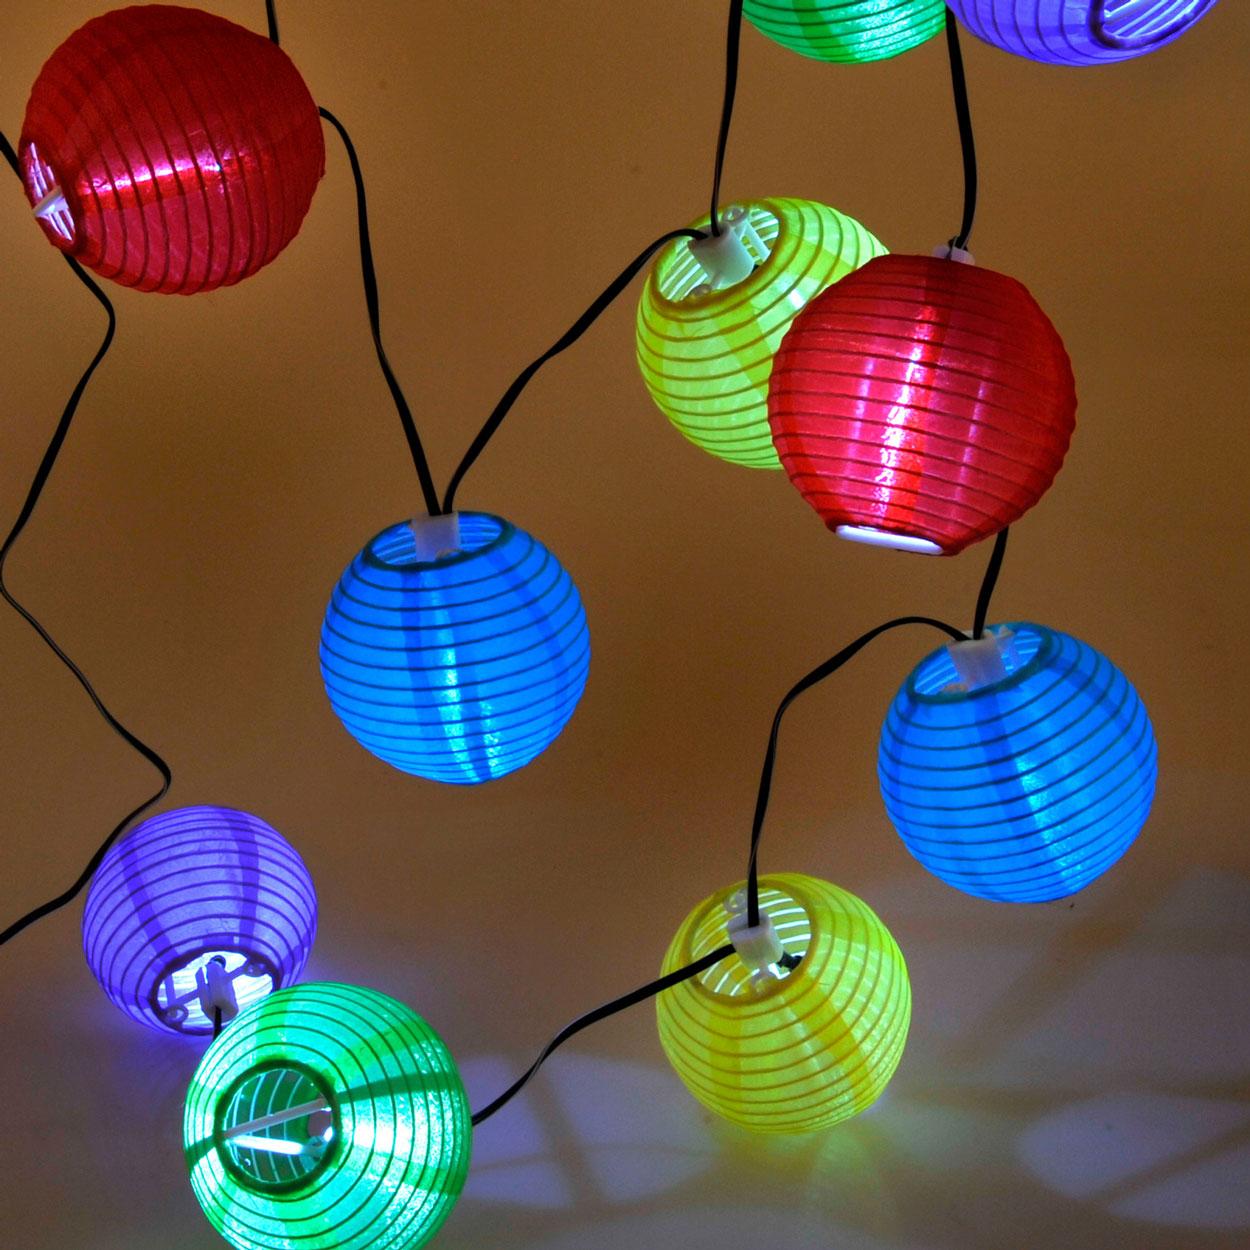 solar lampionsnoer 10 lampjes online kopen. Black Bedroom Furniture Sets. Home Design Ideas